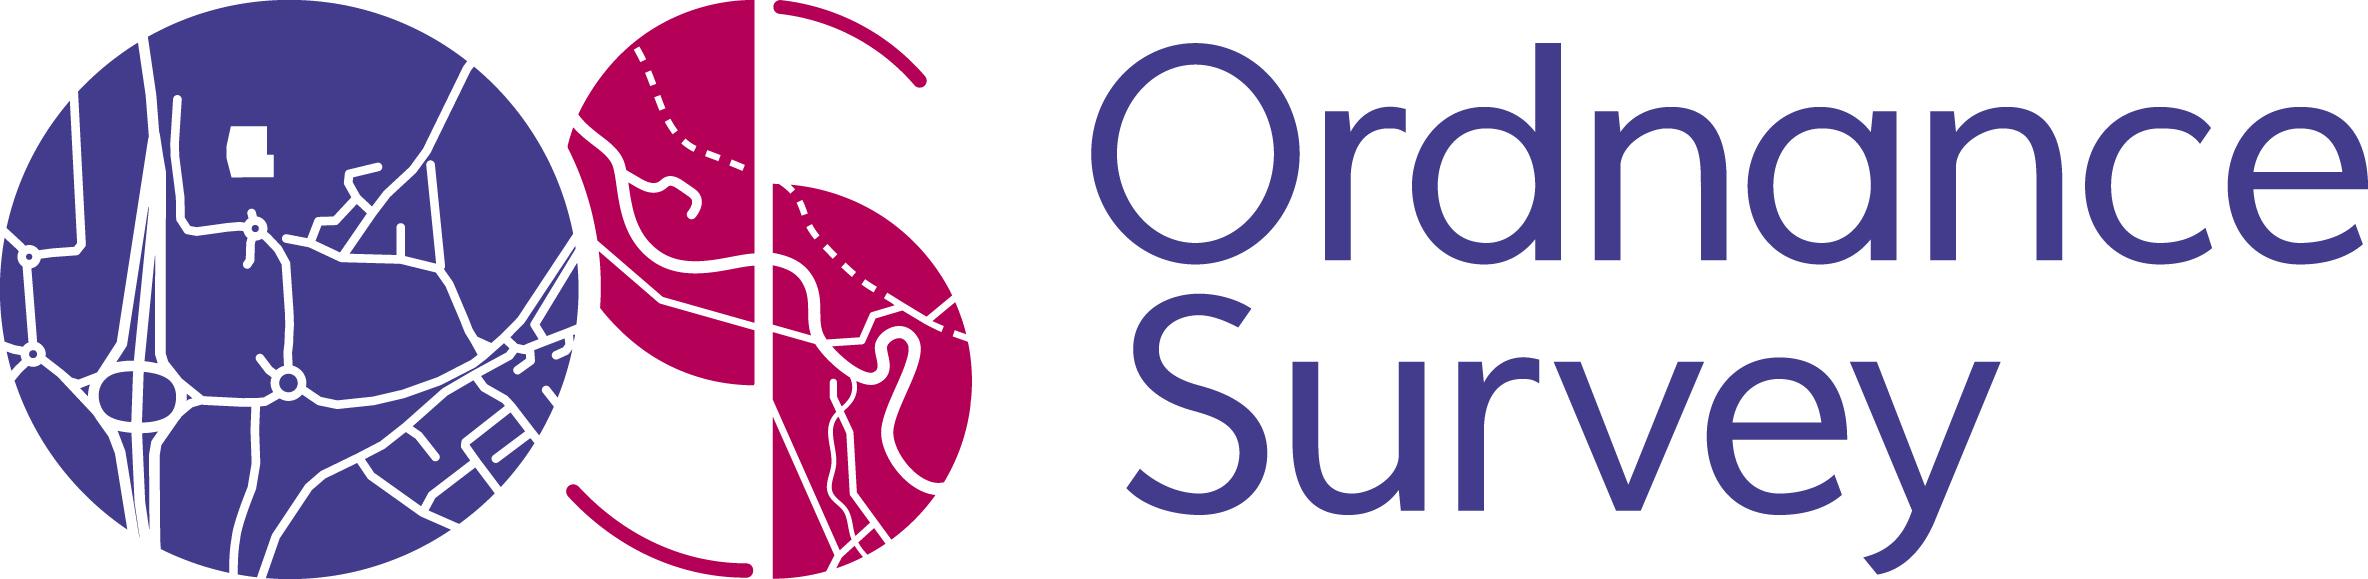 Ordnance Survey.jpg